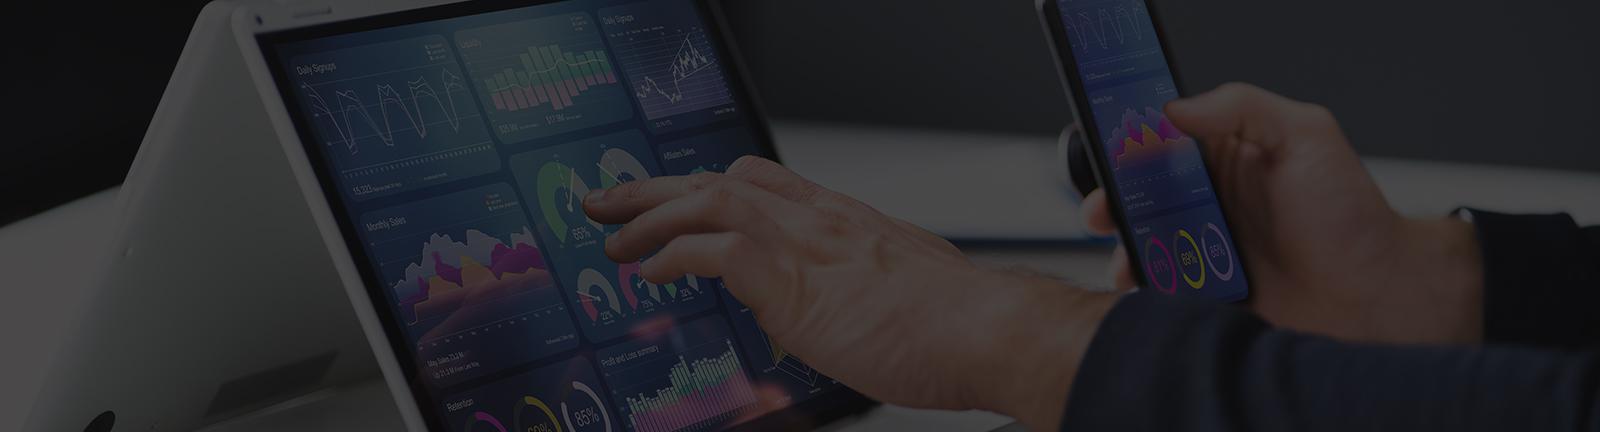 Part 4: Key CX metrics and KPIs